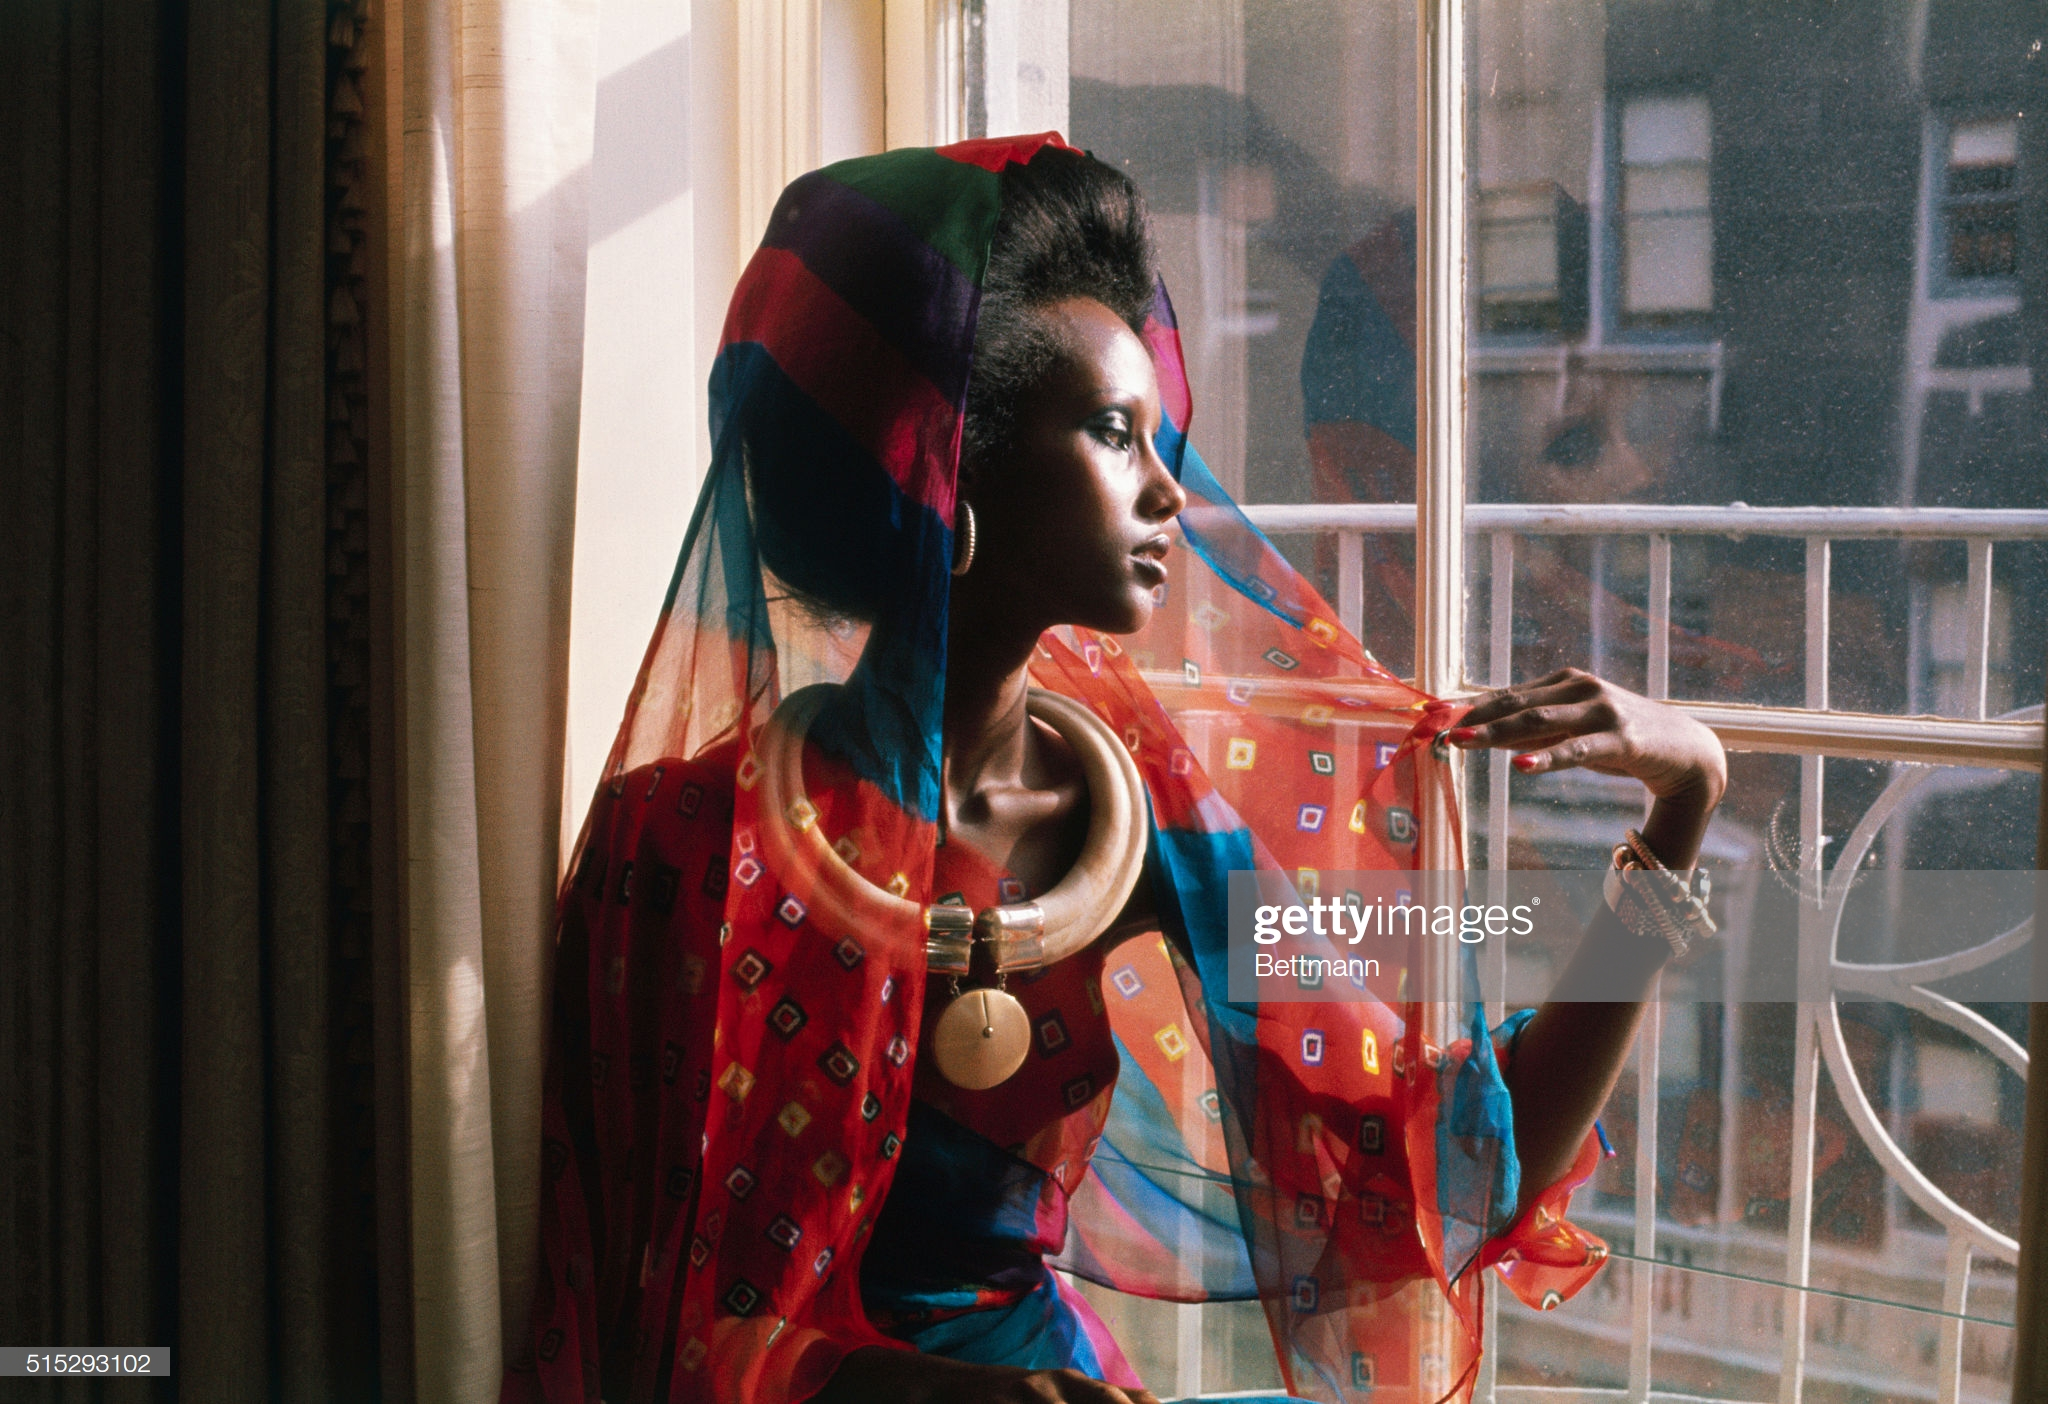 Fashion Model Iman by Window : News Photo